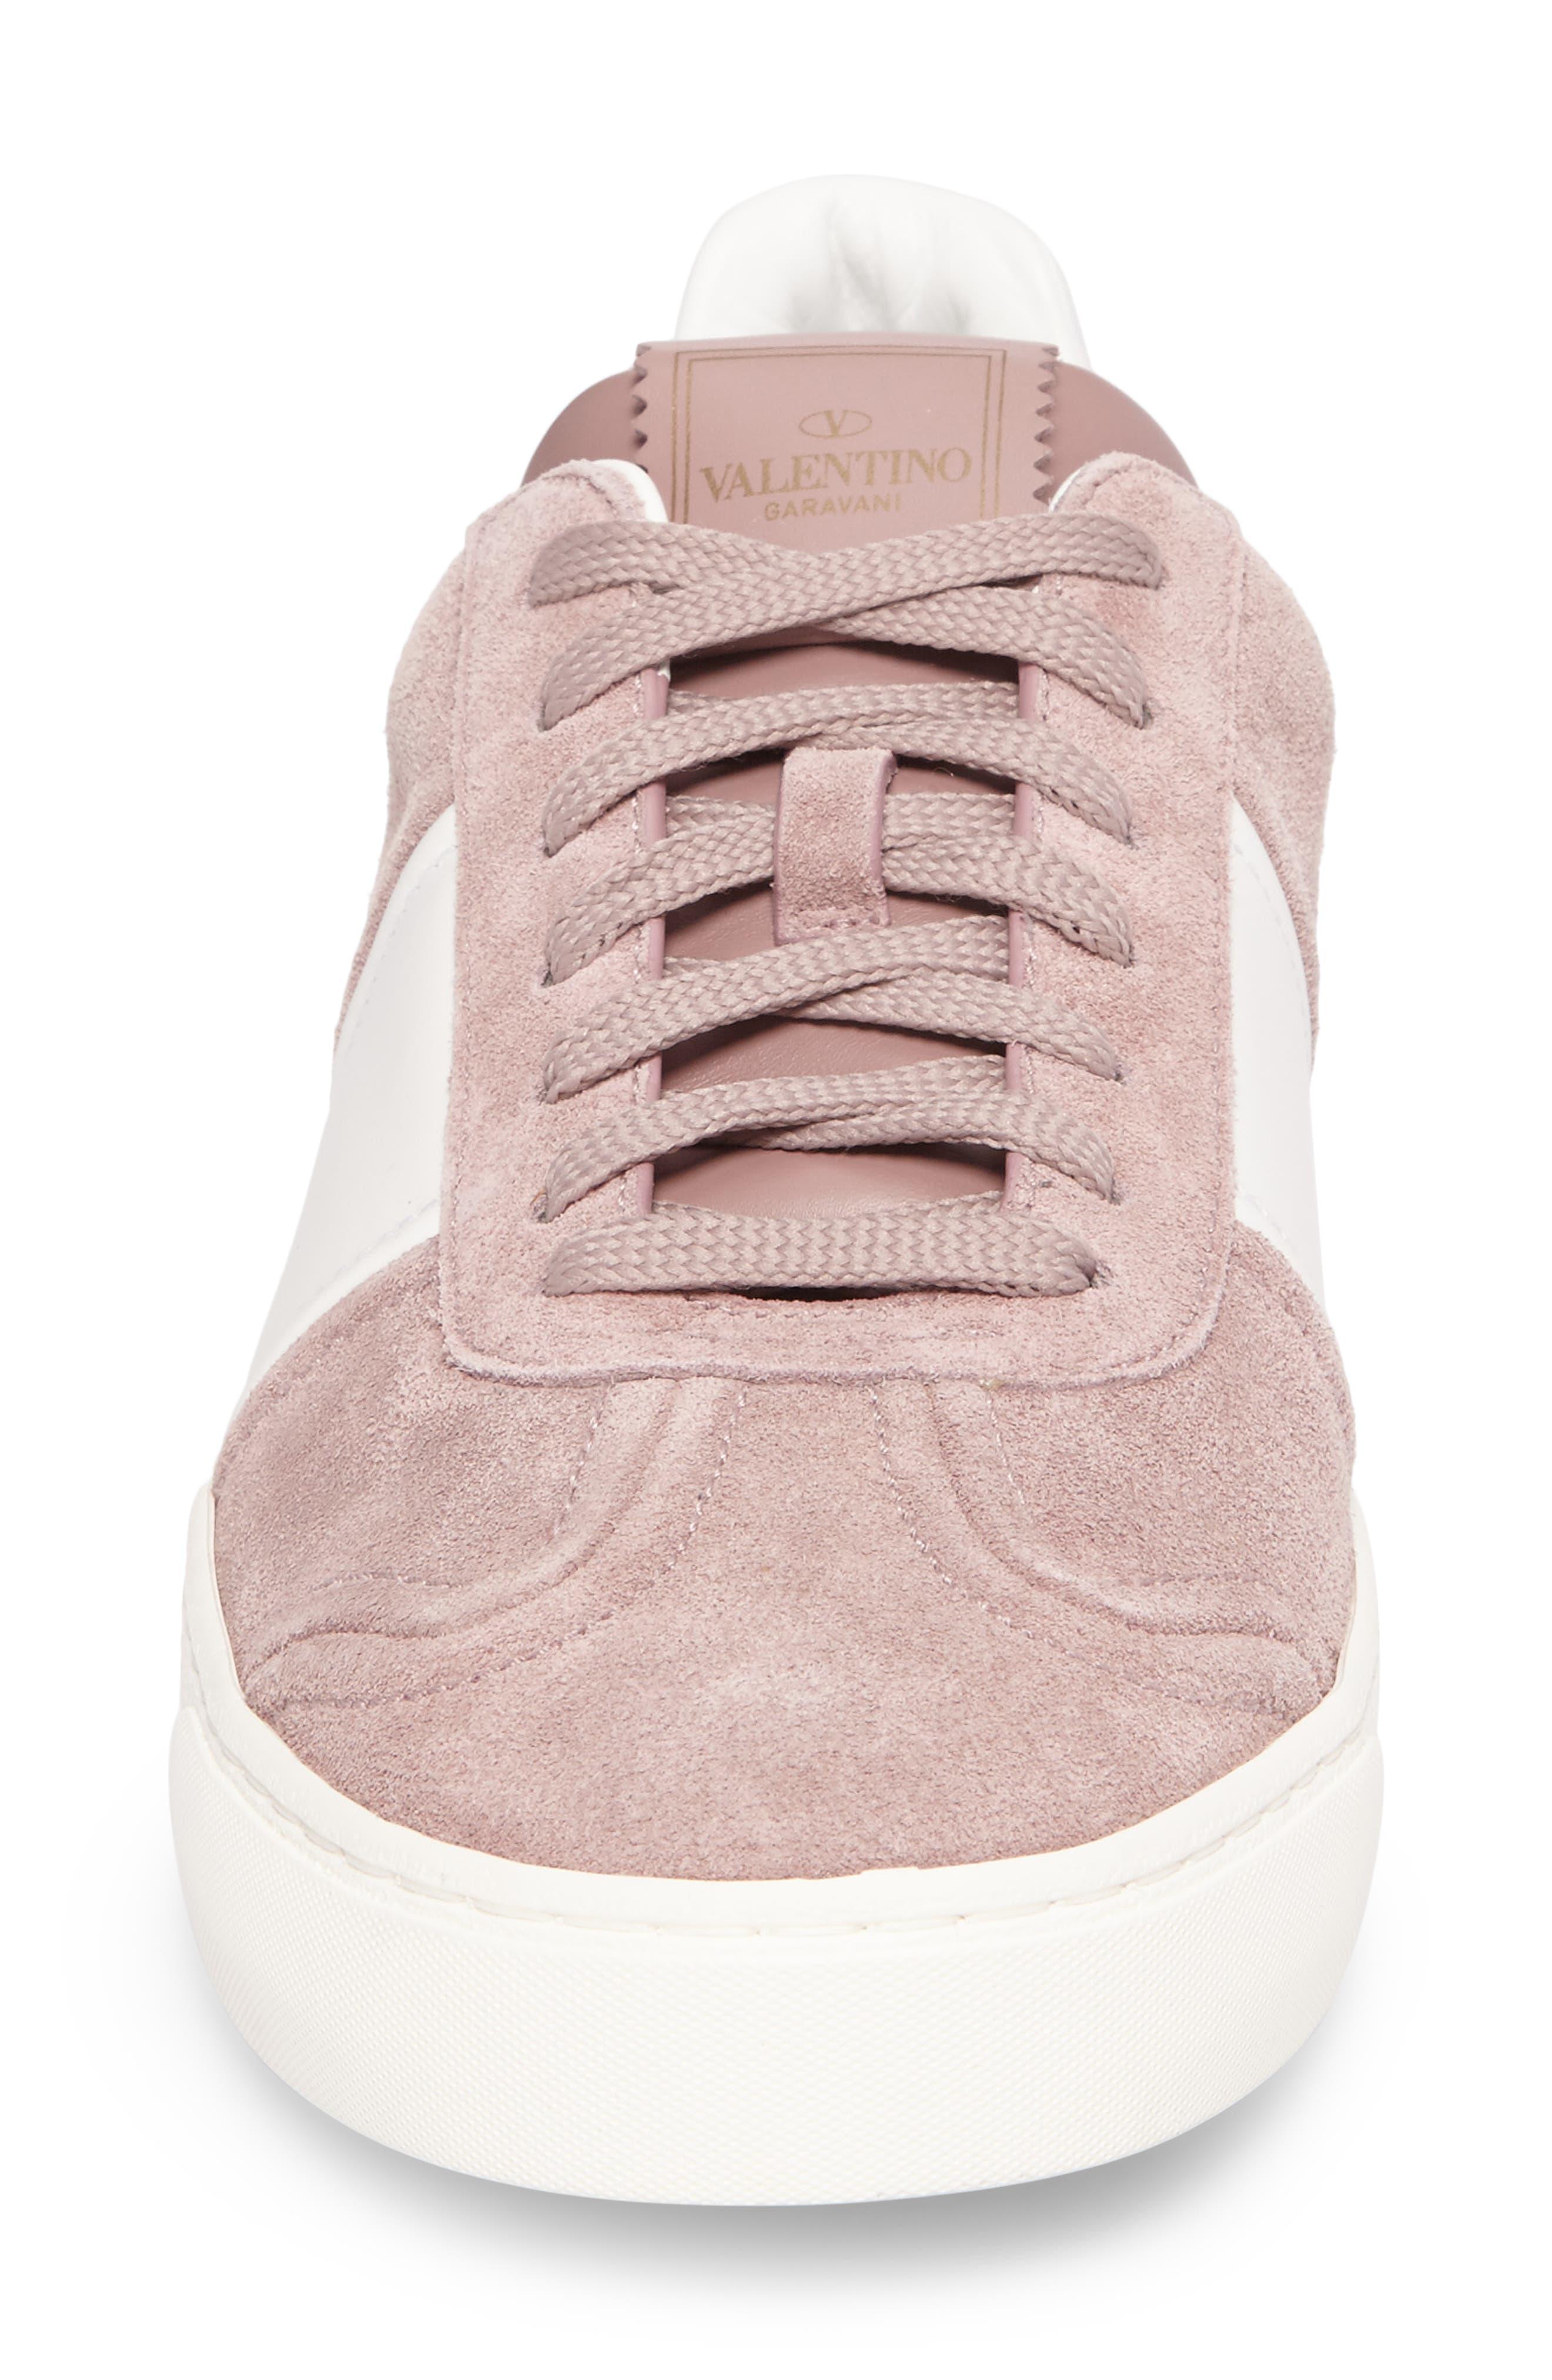 Fly Crew Sneaker,                             Alternate thumbnail 4, color,                             Lipstick/ Bianco